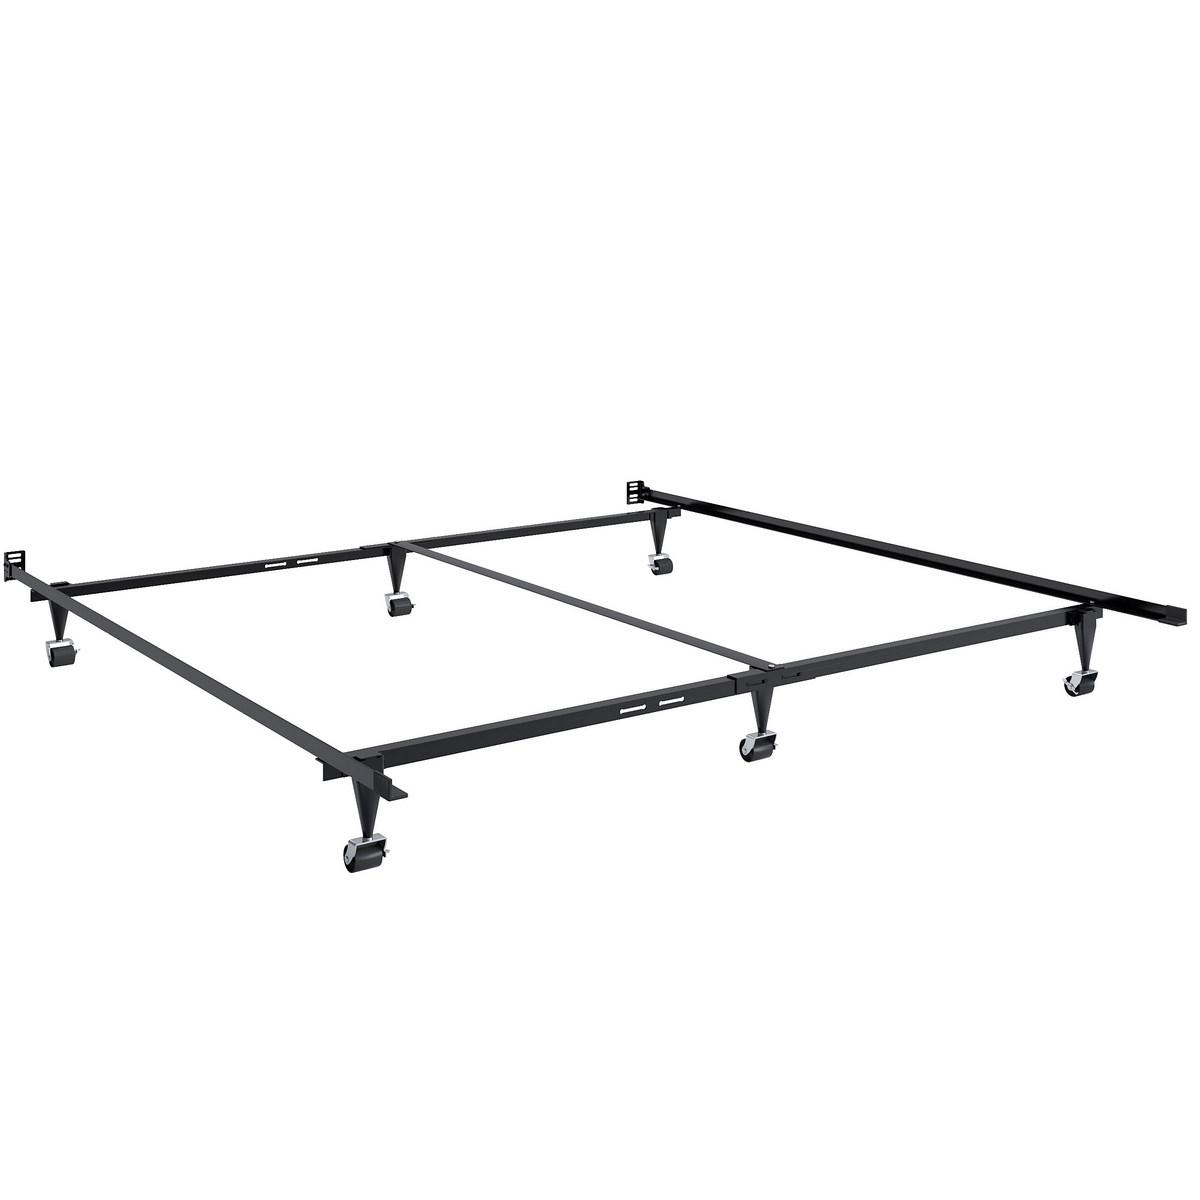 CorLiving BAL-201-F Adjustable Queen or King Metal Bed Frame